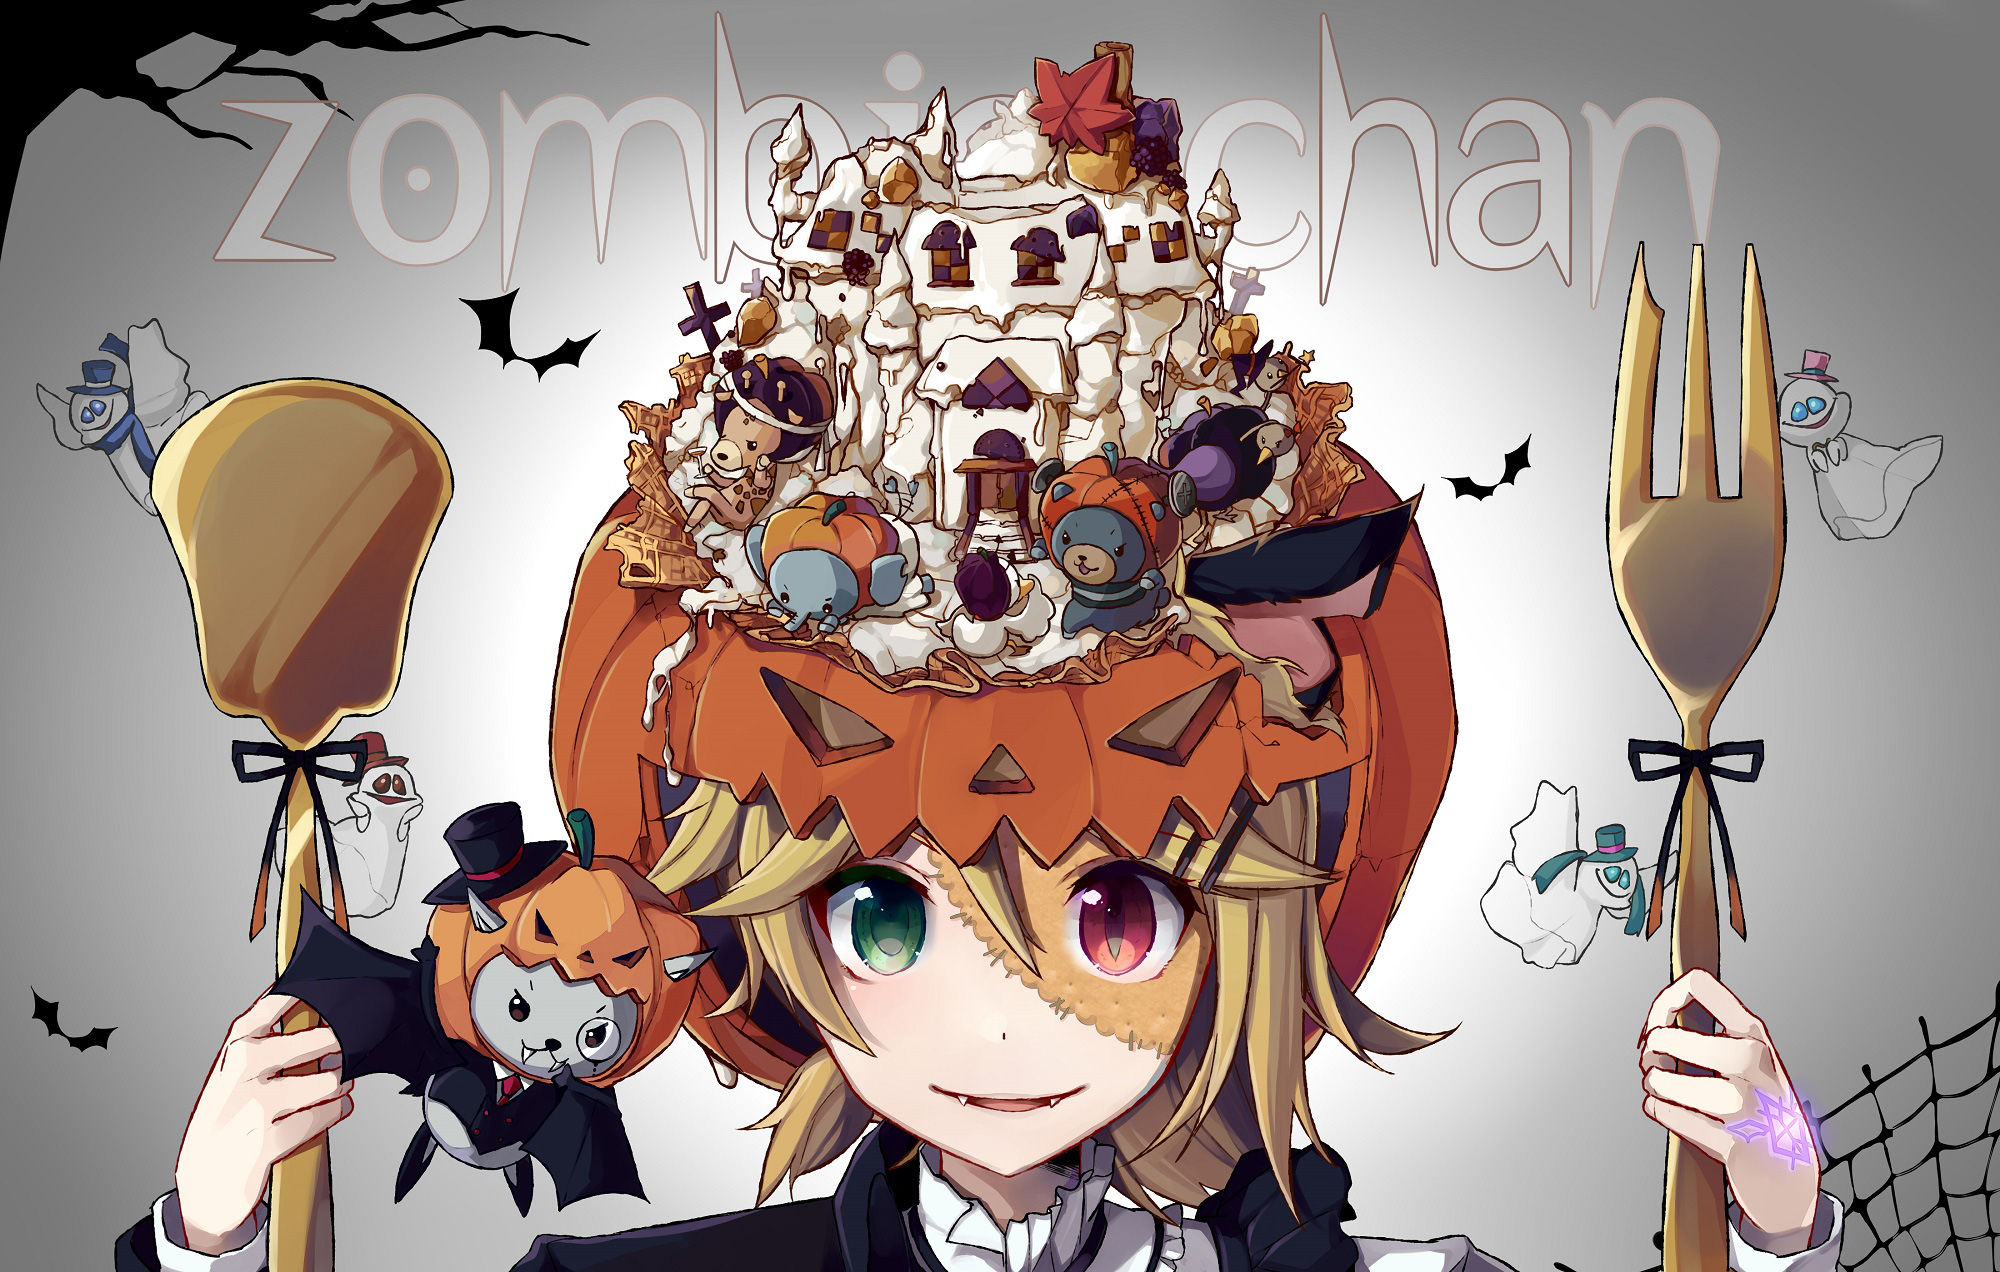 10-Amazing-Halloween-Pixiv-Artworks-#10_ぞんびちゃん_のう_Haruhichan.com